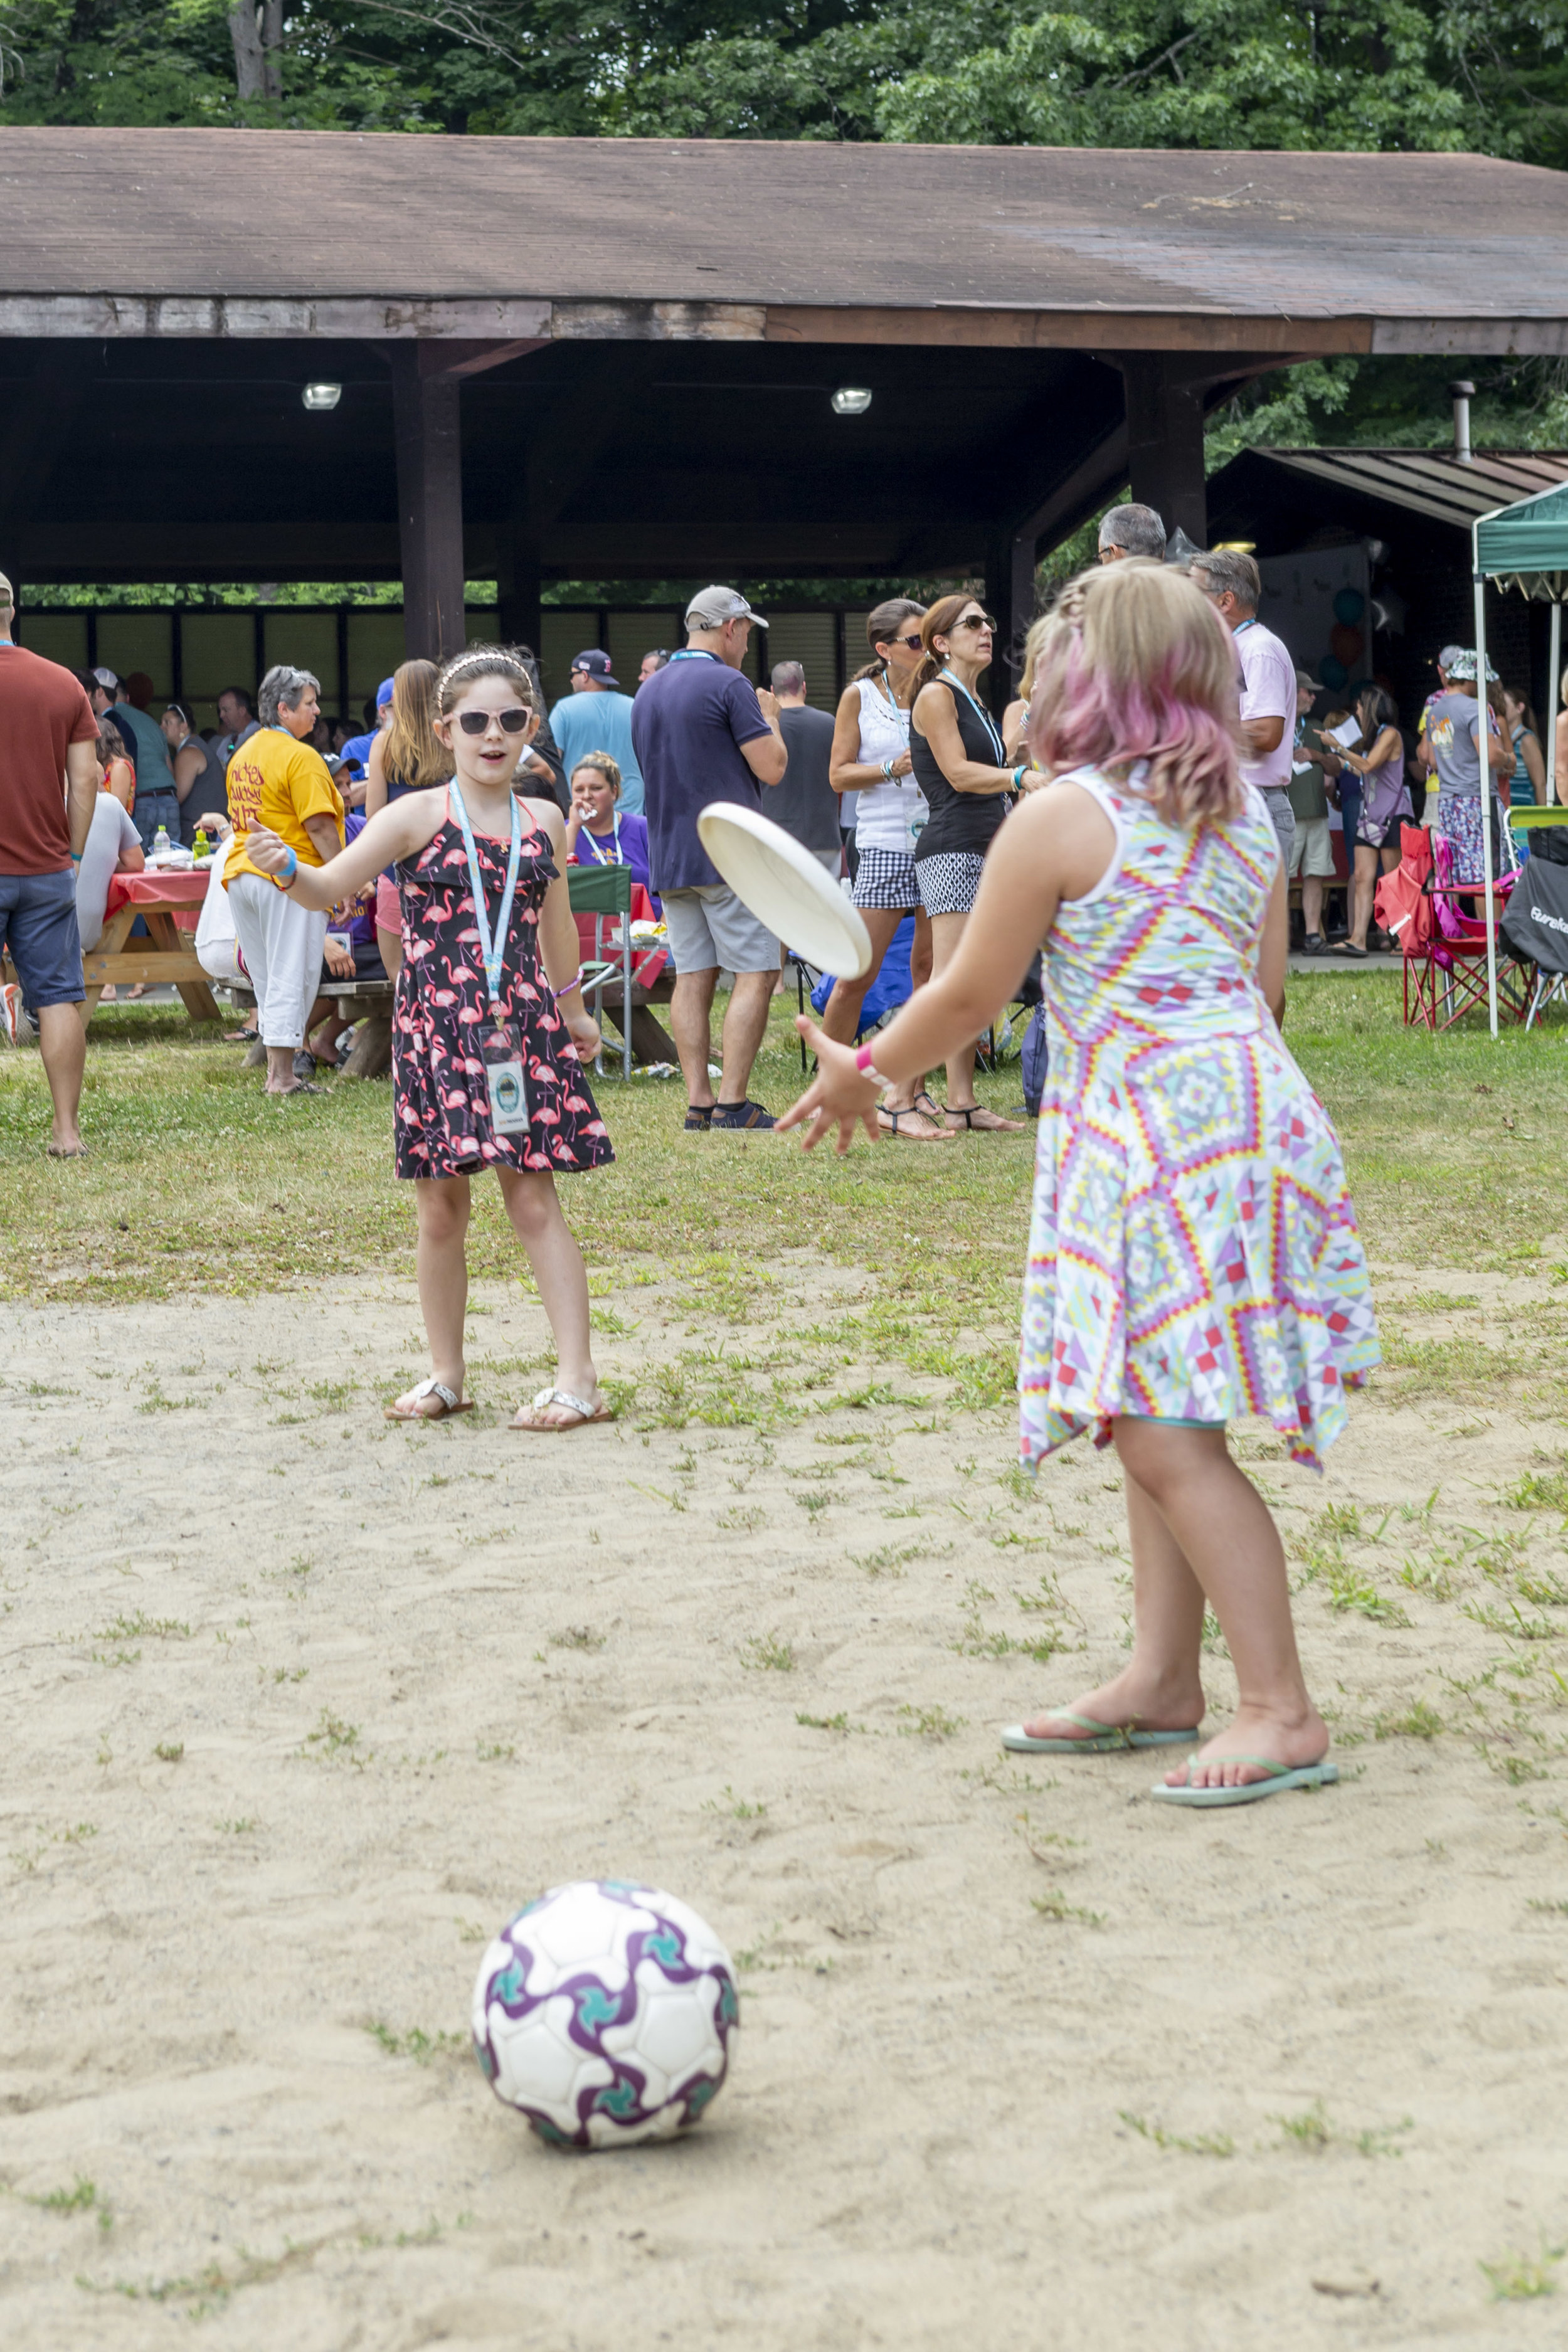 (2018.07.14) Ballsfest Saratoga Spa State Park-3796.jpg